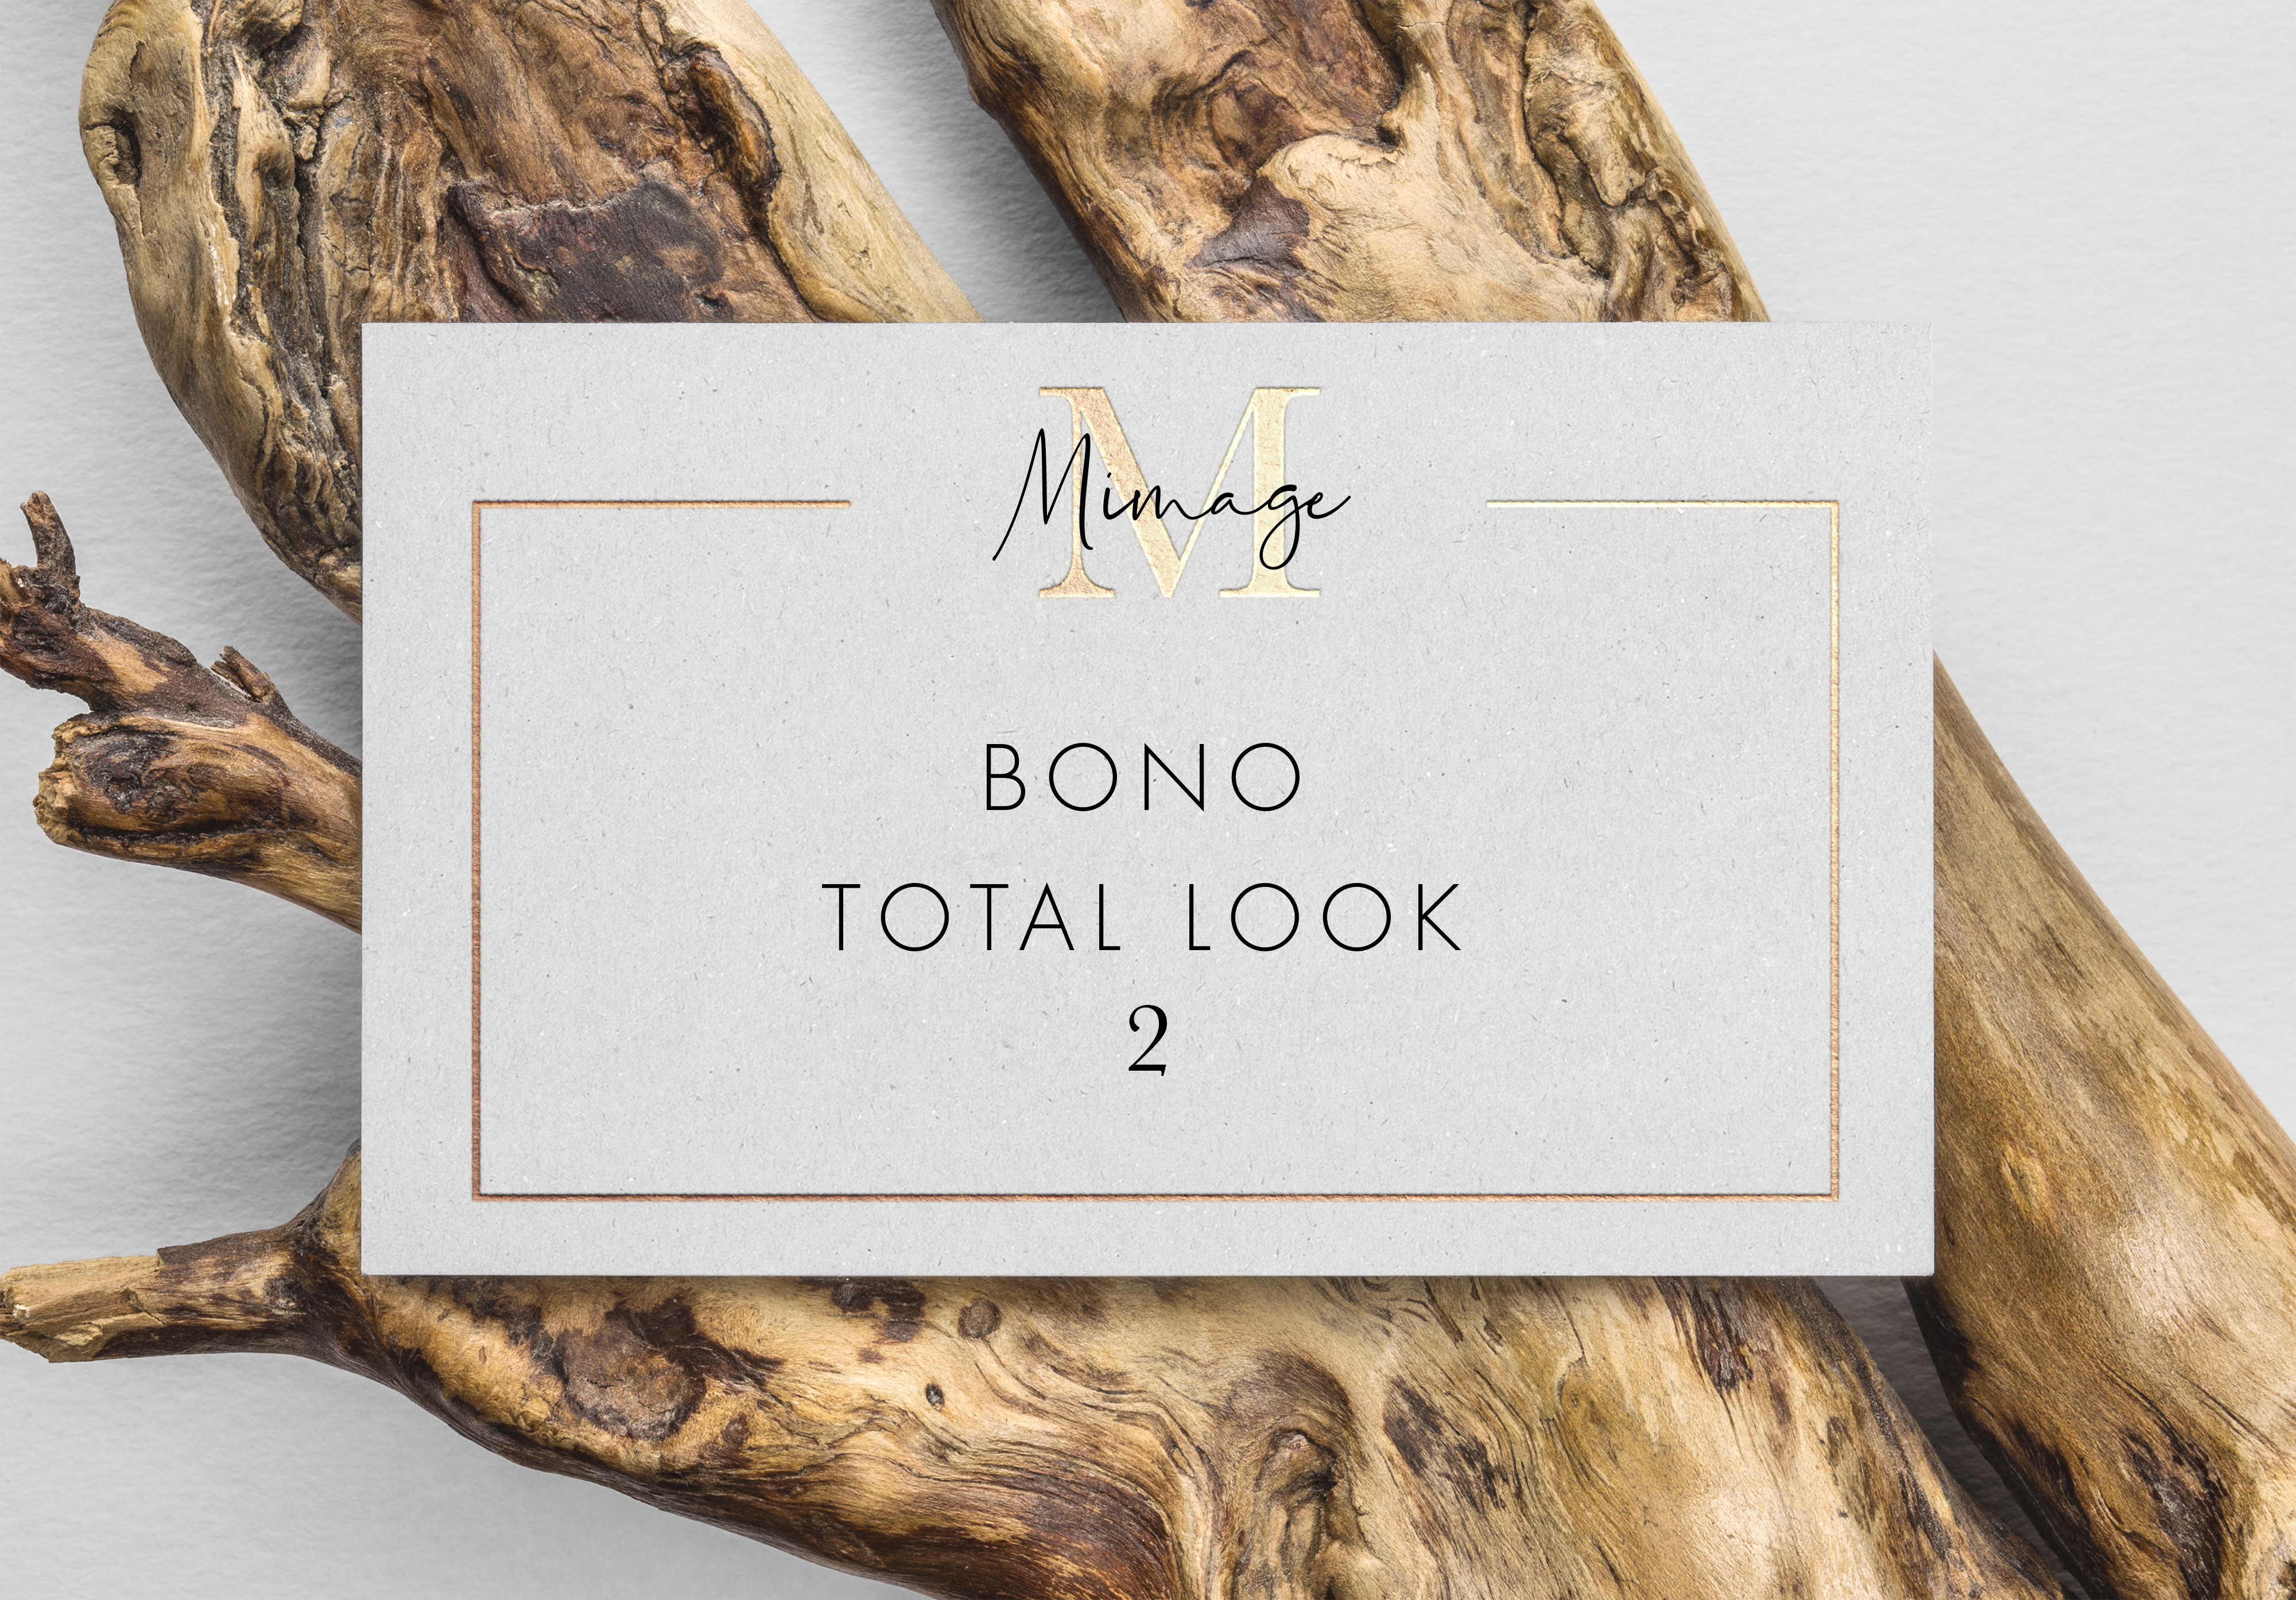 Bono 2 total look